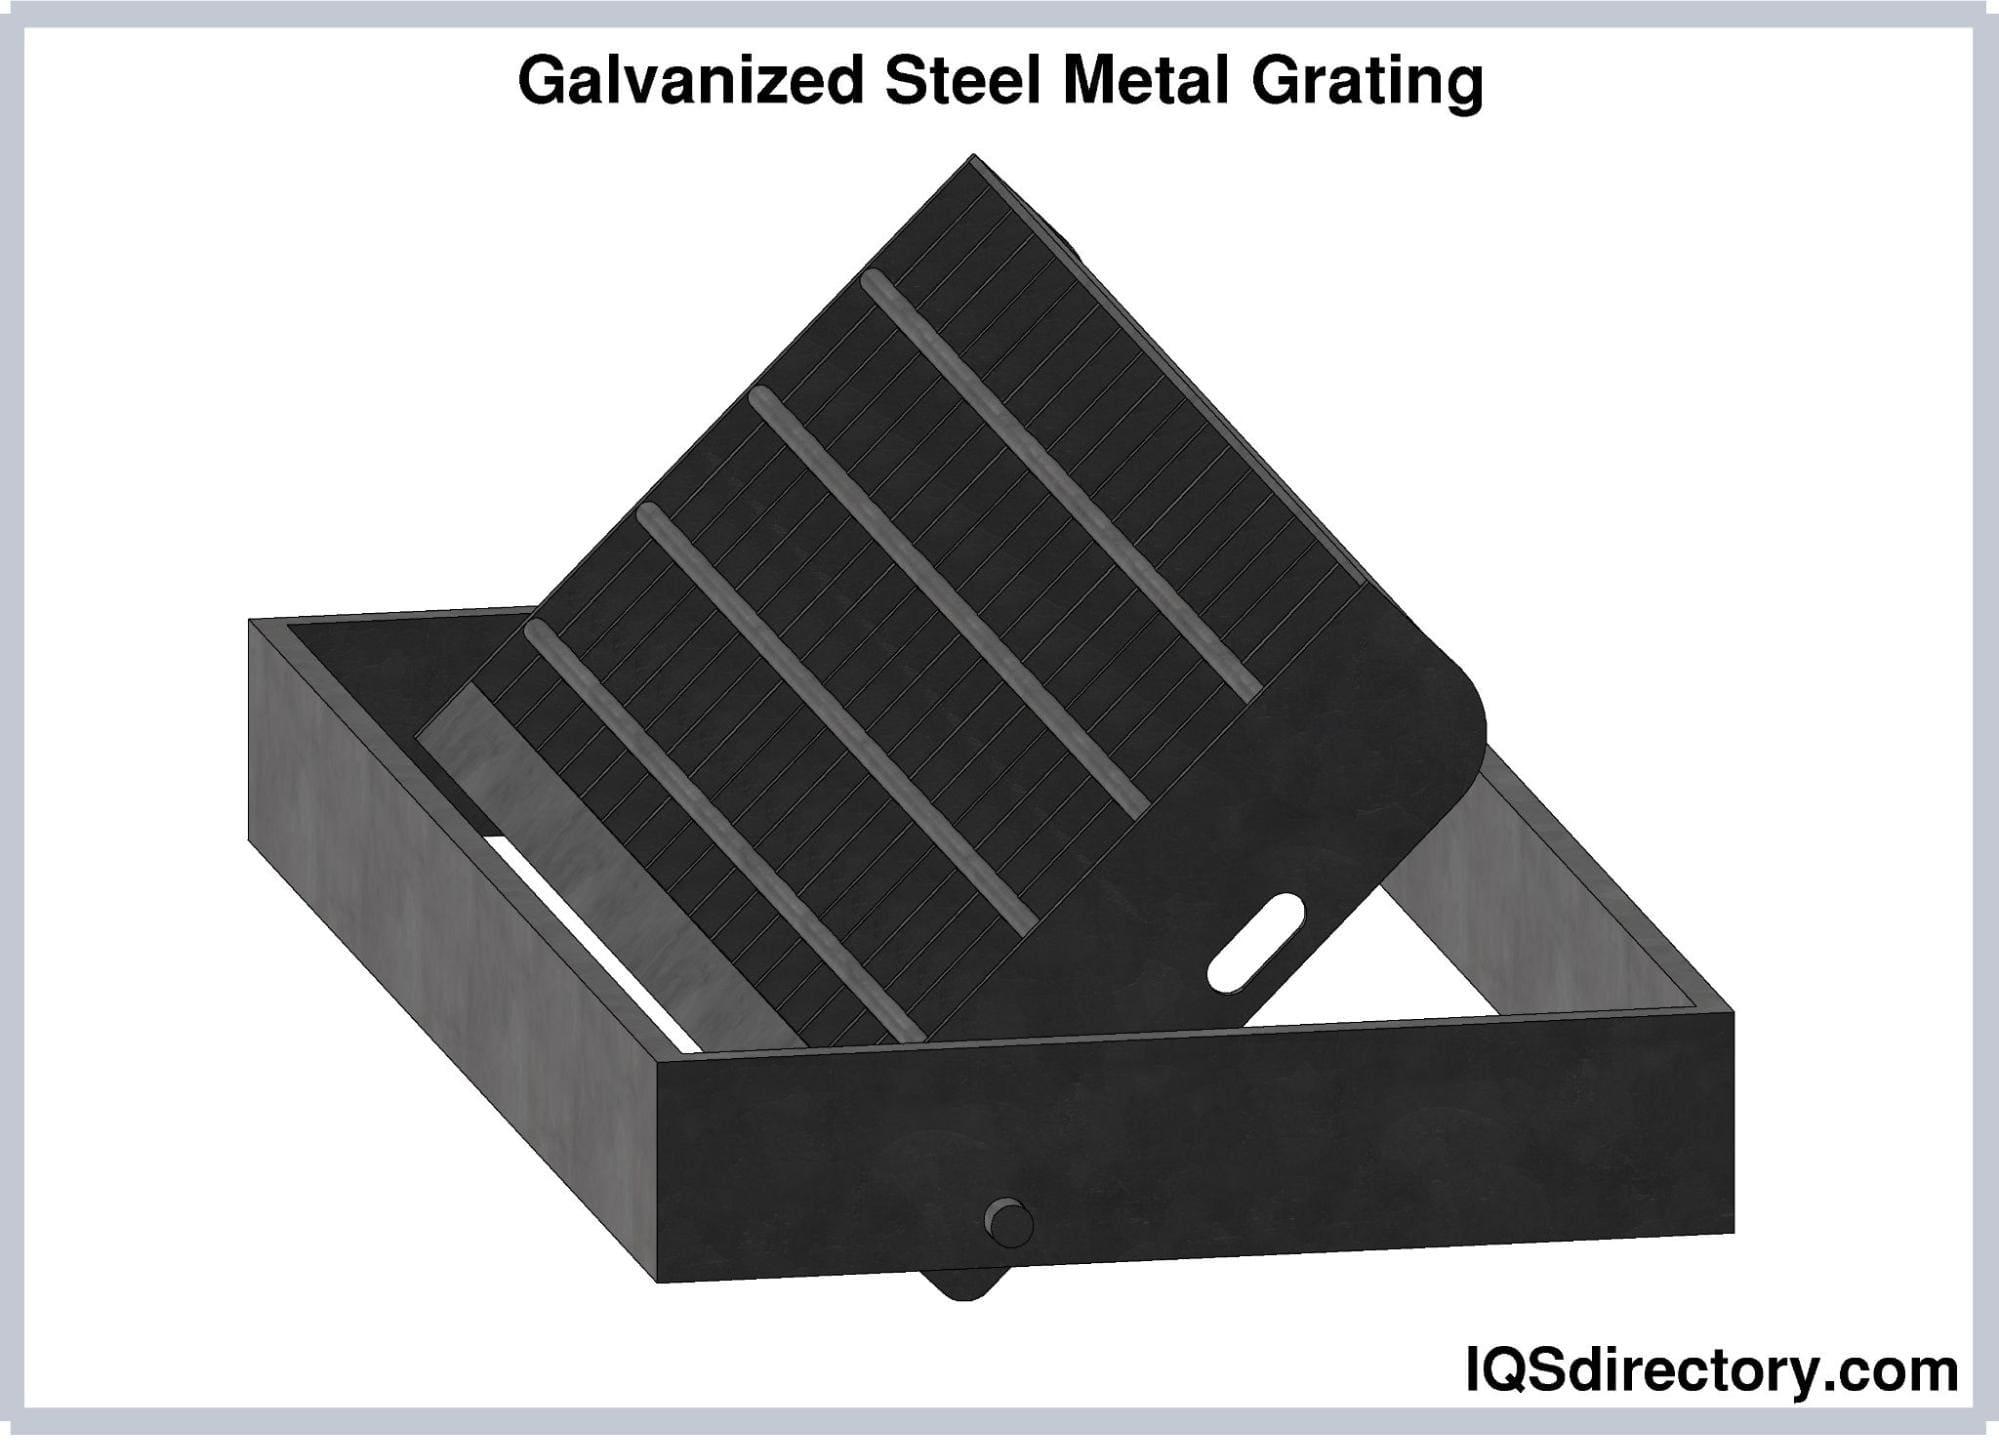 Galvanized Steel Metal Grating